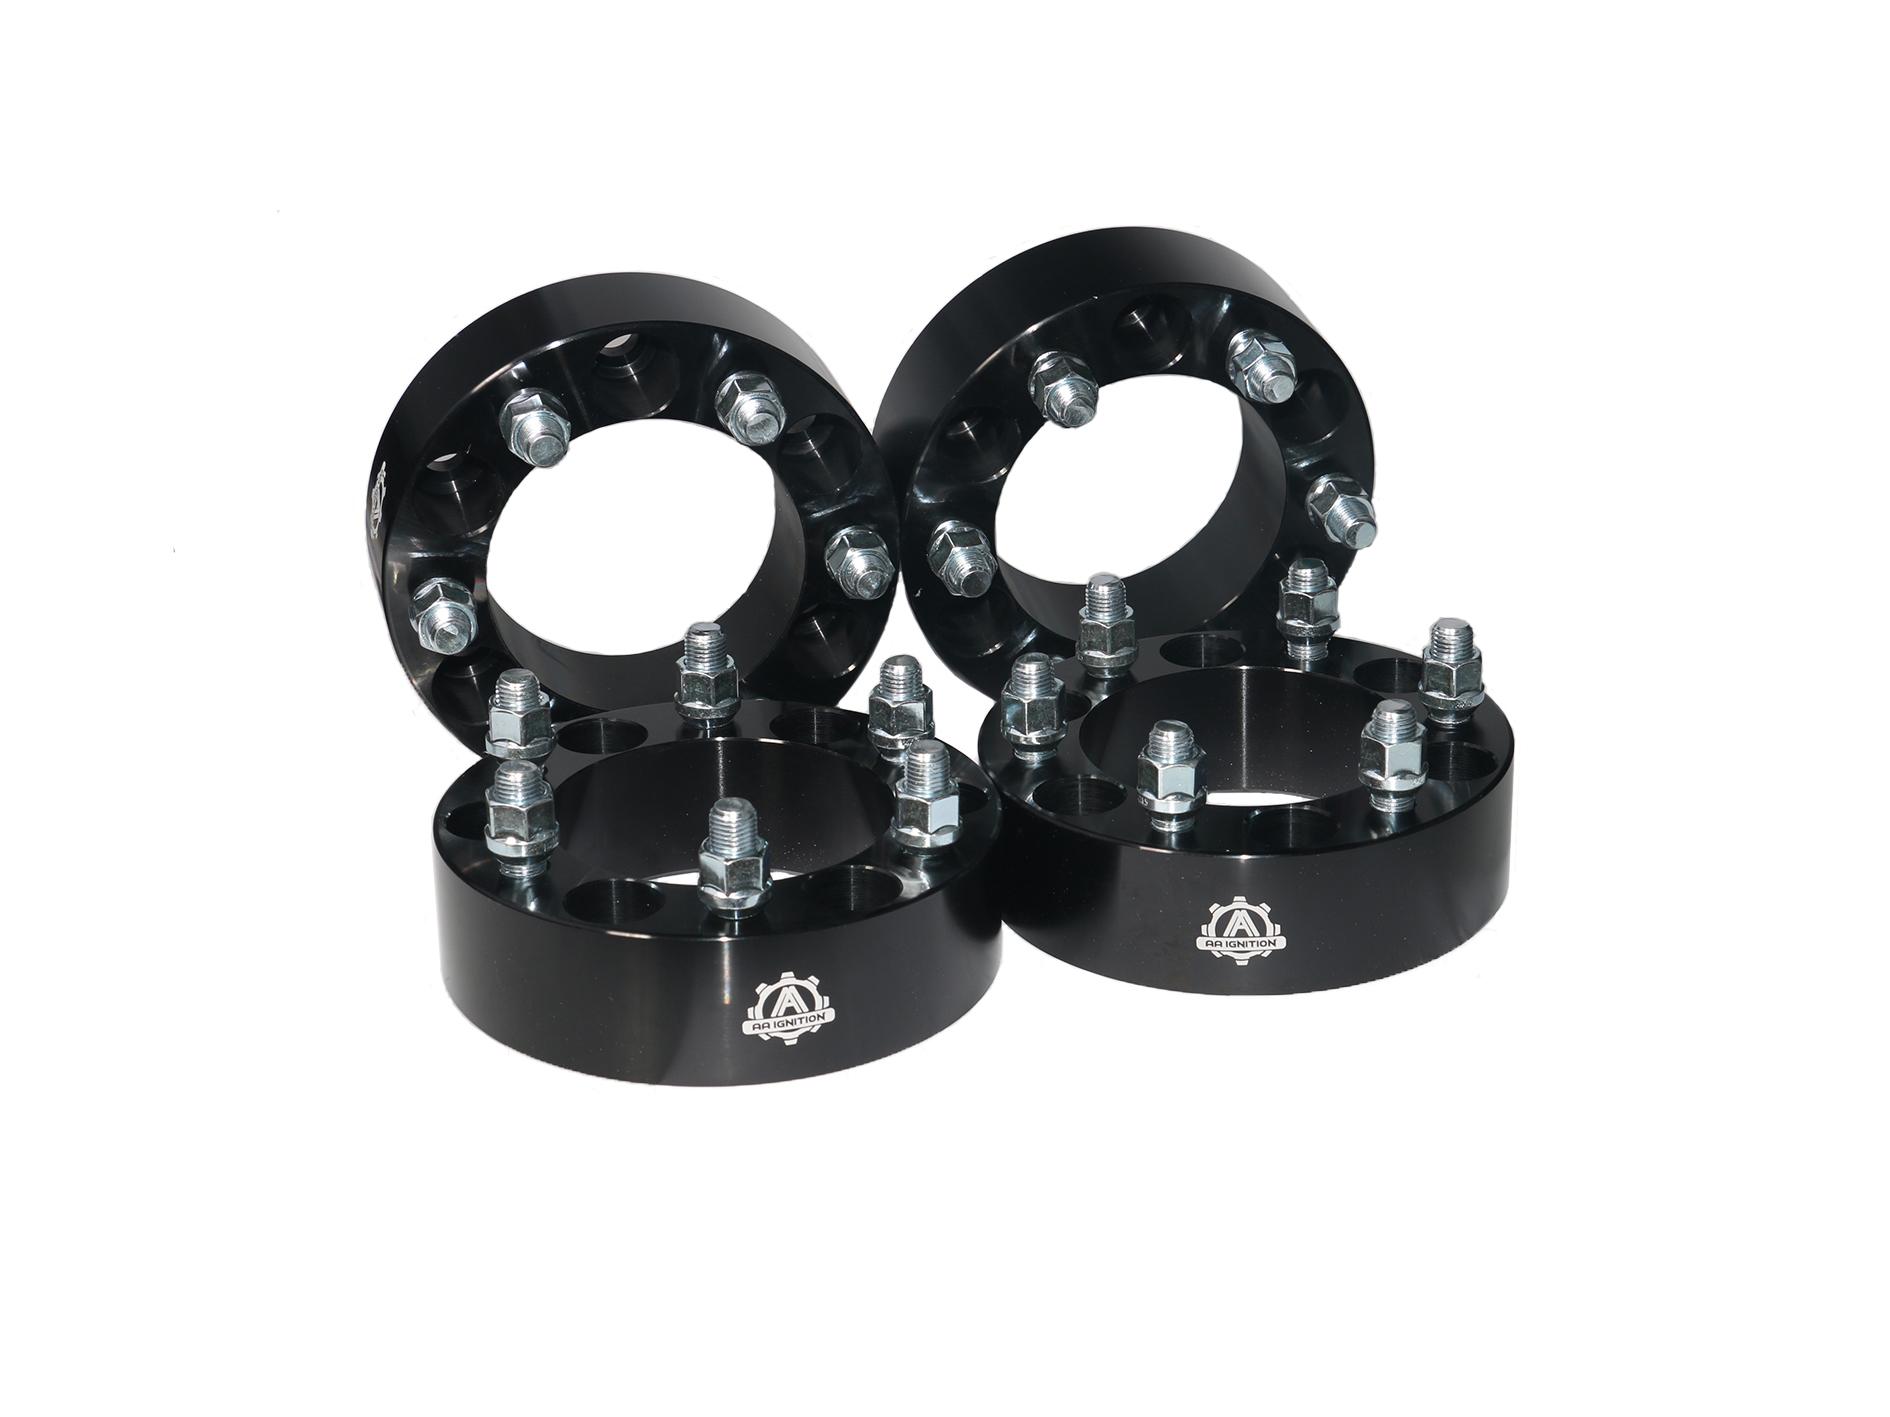 "Wheel Spacer Set of 4-6 Lug 2"" 50mm Hub & Wheel Centric Adapter Kit 6x5.5"" Fits GM Image"